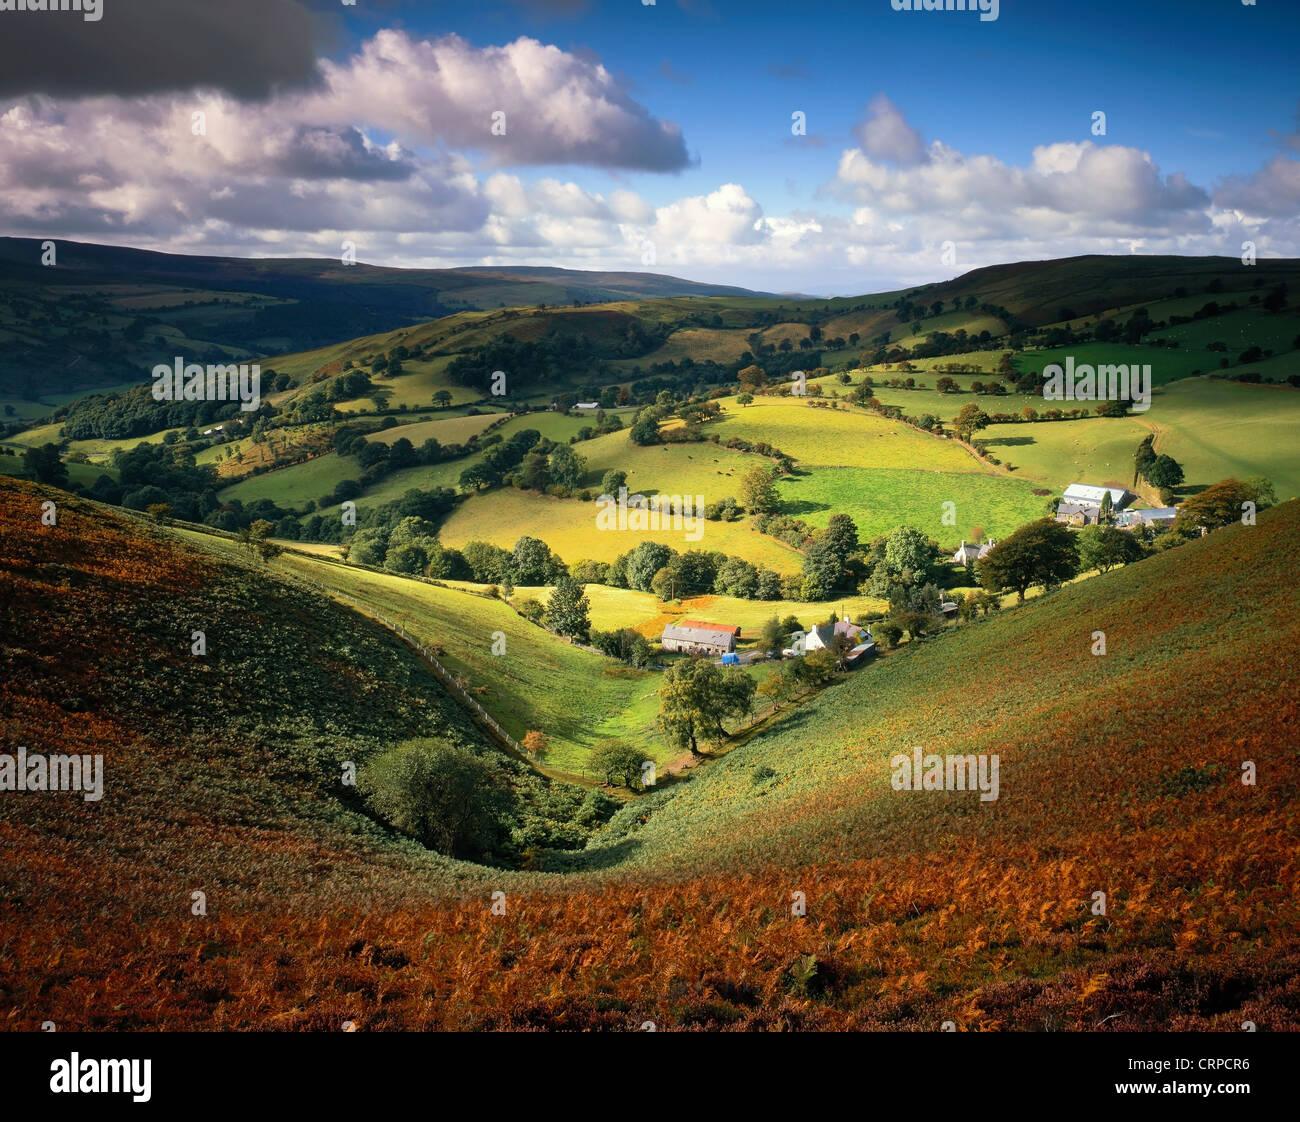 Blick über ein Farn bewachsenen Tal in den Llantysilio Hügeln im Spätsommer. Stockbild